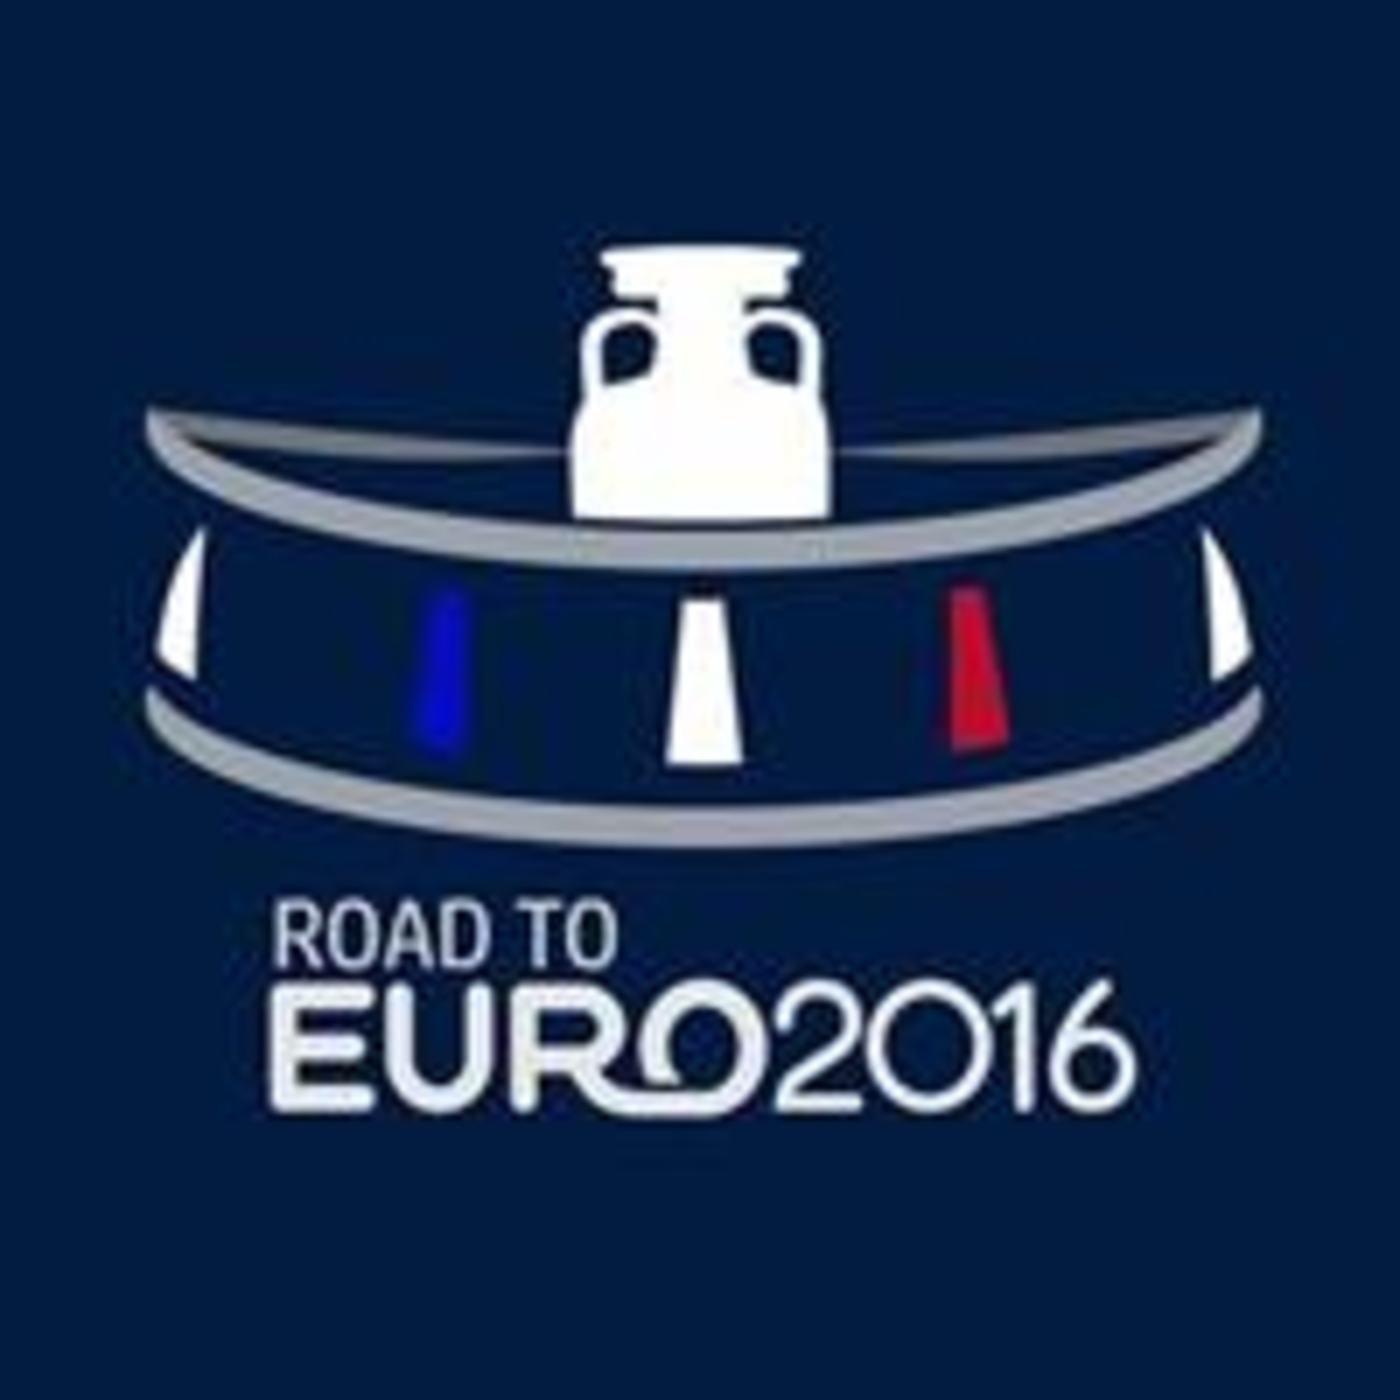 <![CDATA[Road To Euro 2016]]>